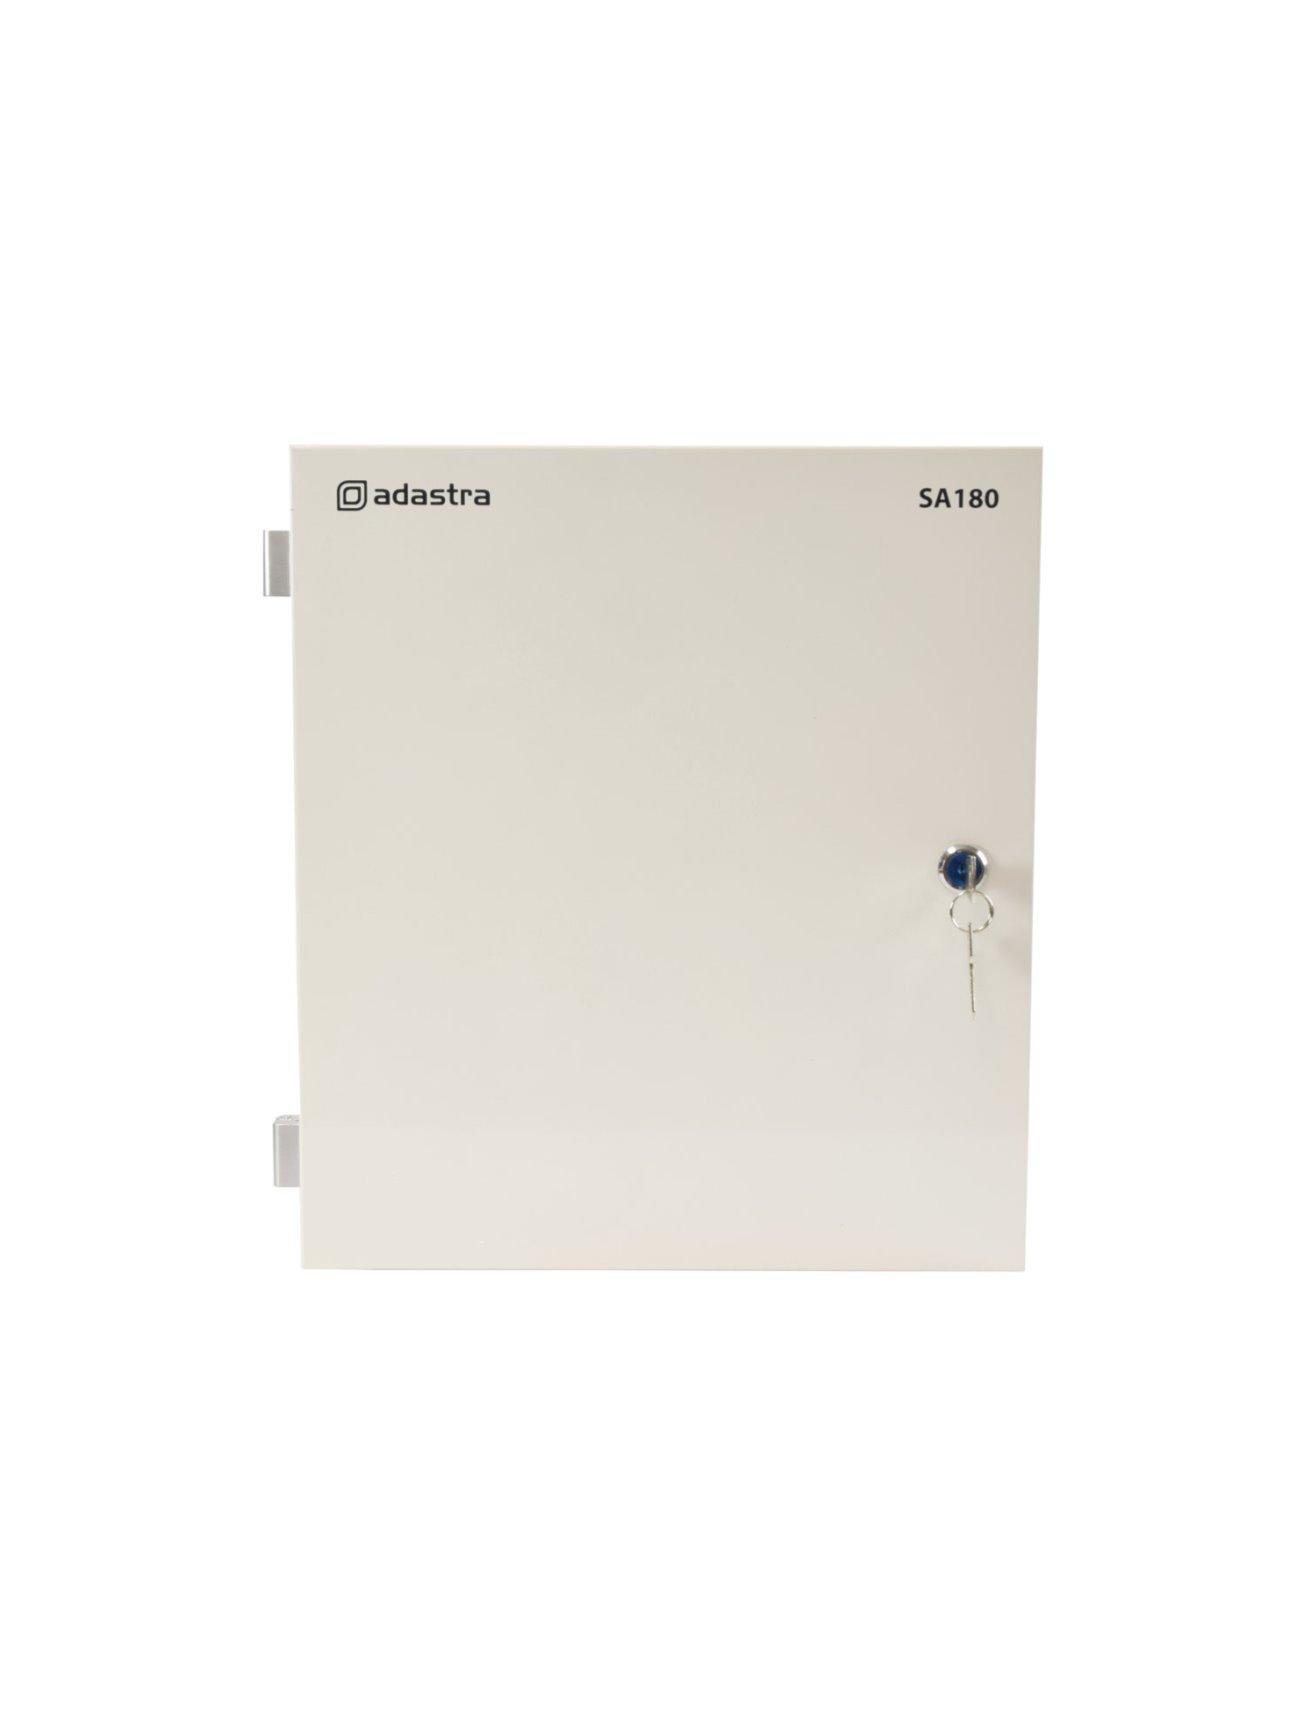 Adastra SA180 100V/8Ω Επιτοίχιος Μίκτης-Ενισχυτής Με USB/SD/Bluetooth/Ασύρματο Μικρόφωνο & Ενσωματωμένο Κυτίο Ασφαλείας 180W